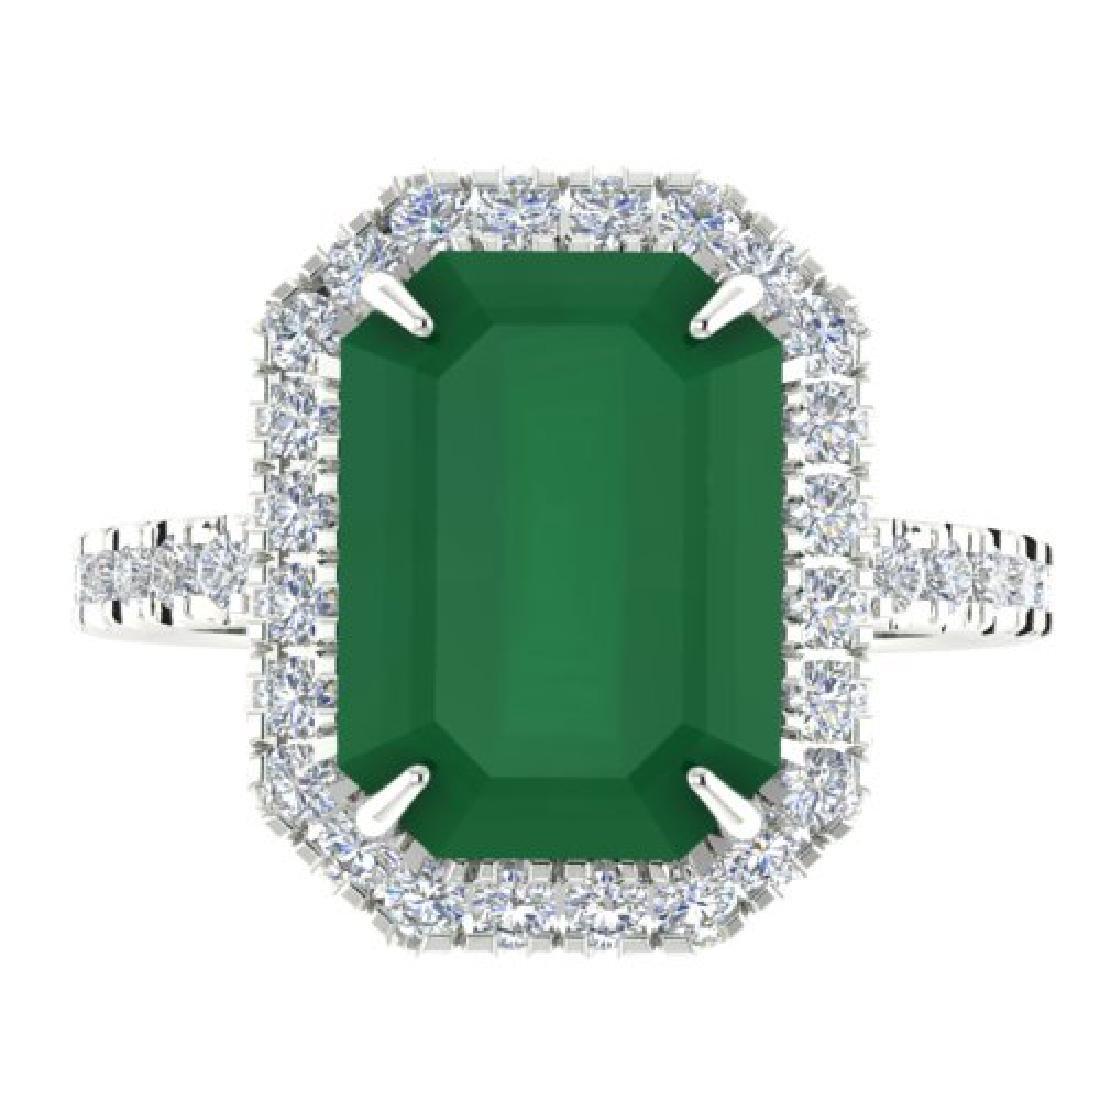 5.33 CTW Emerald And Micro Pave VS/SI Diamond Halo Ring